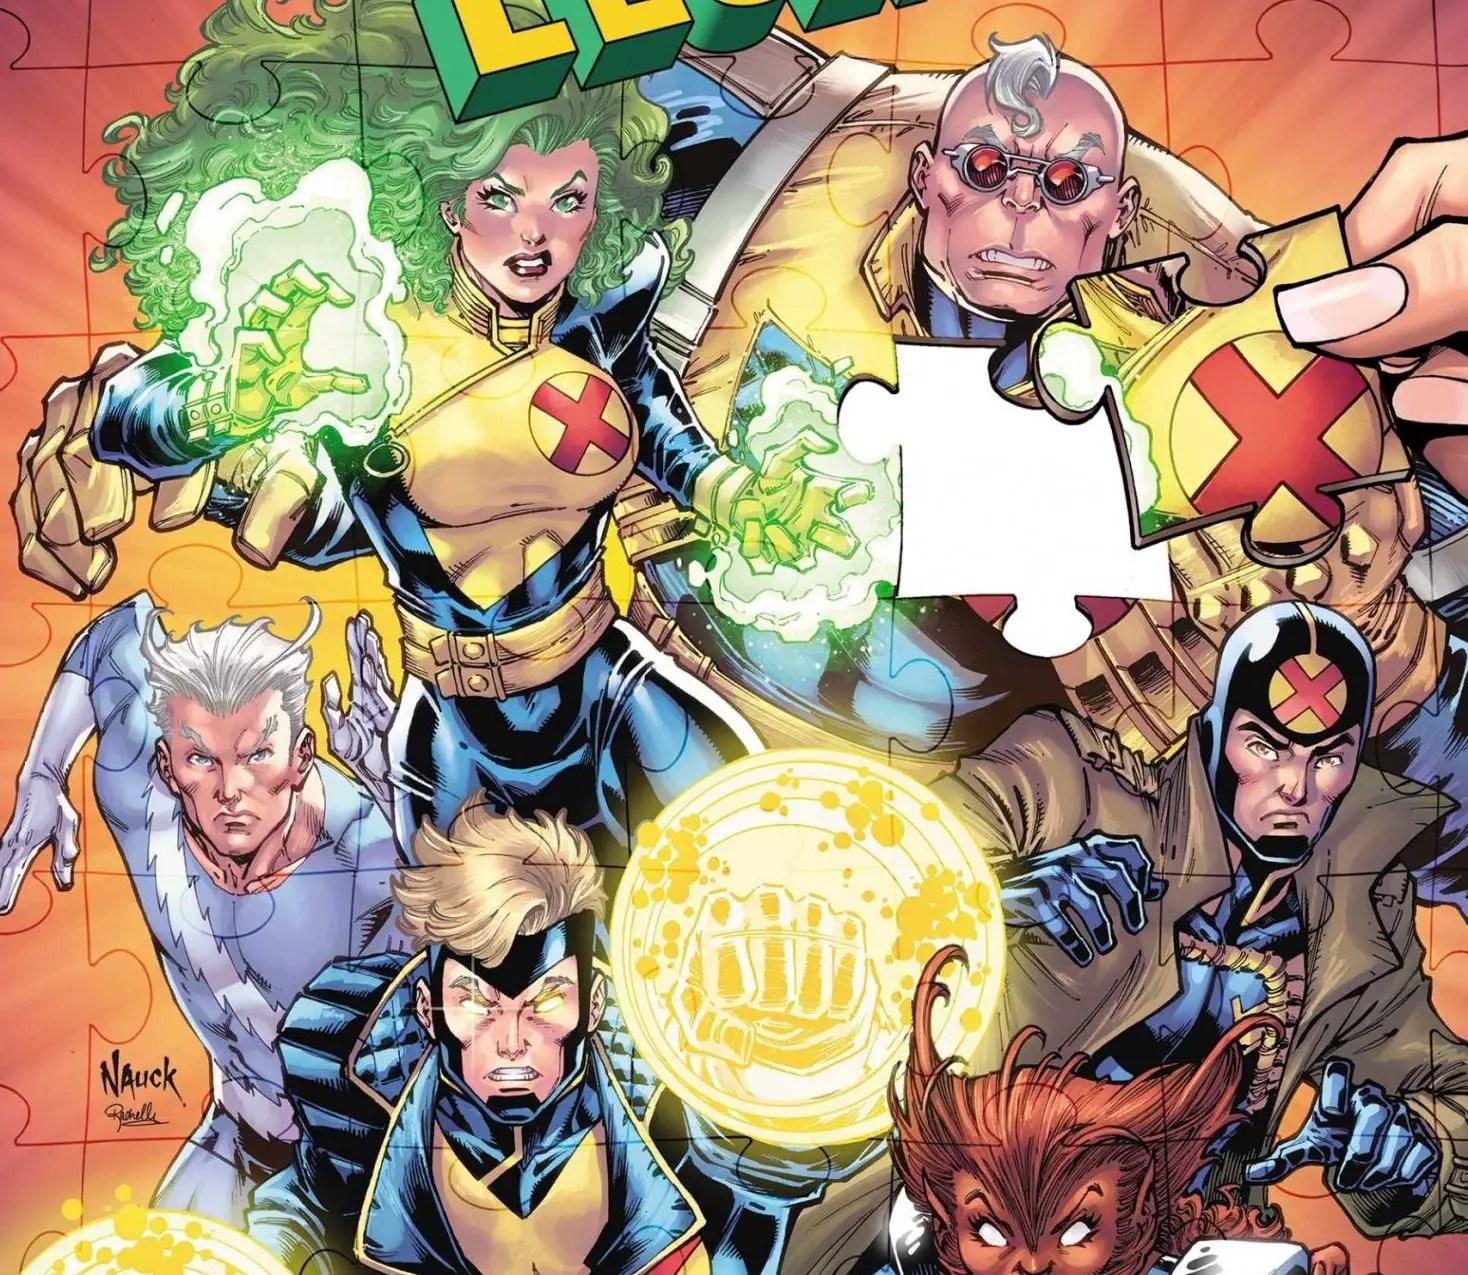 X-Men Legends #5